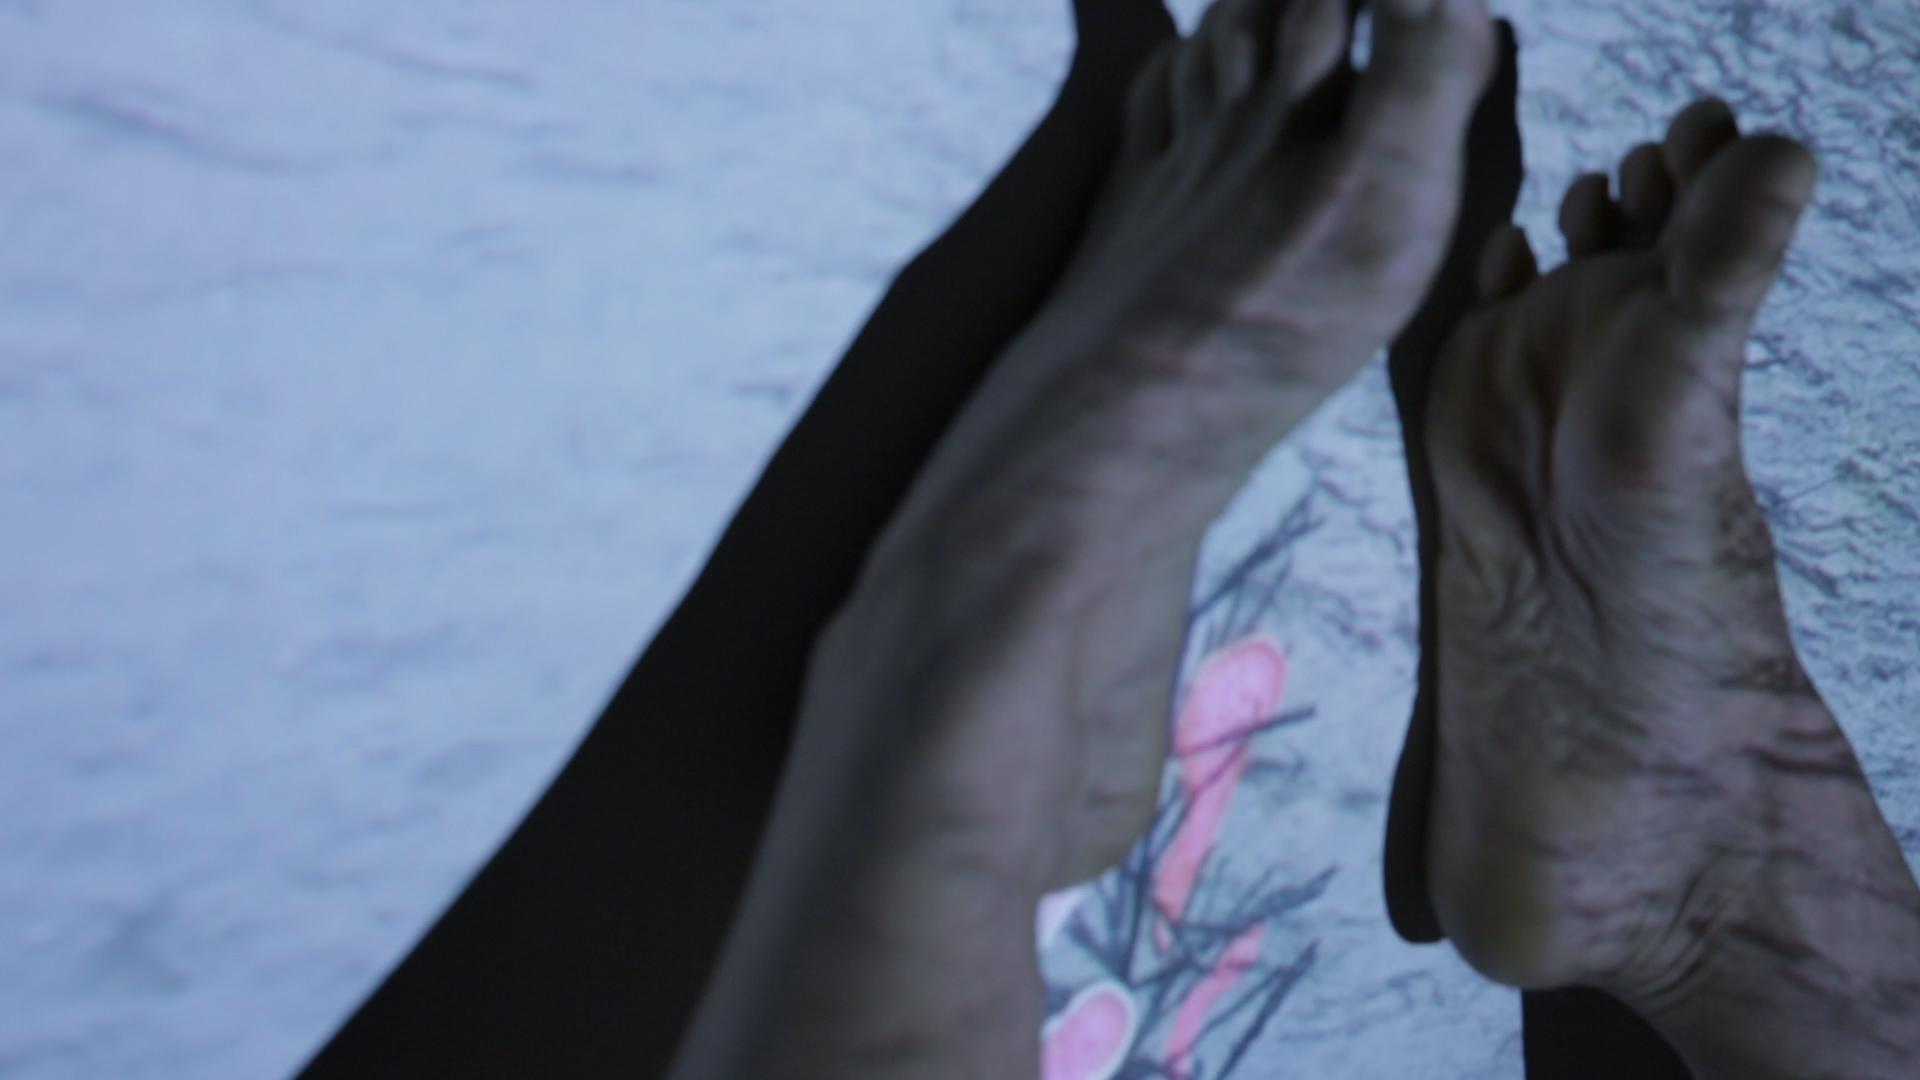 Olek_close up feet.jpg